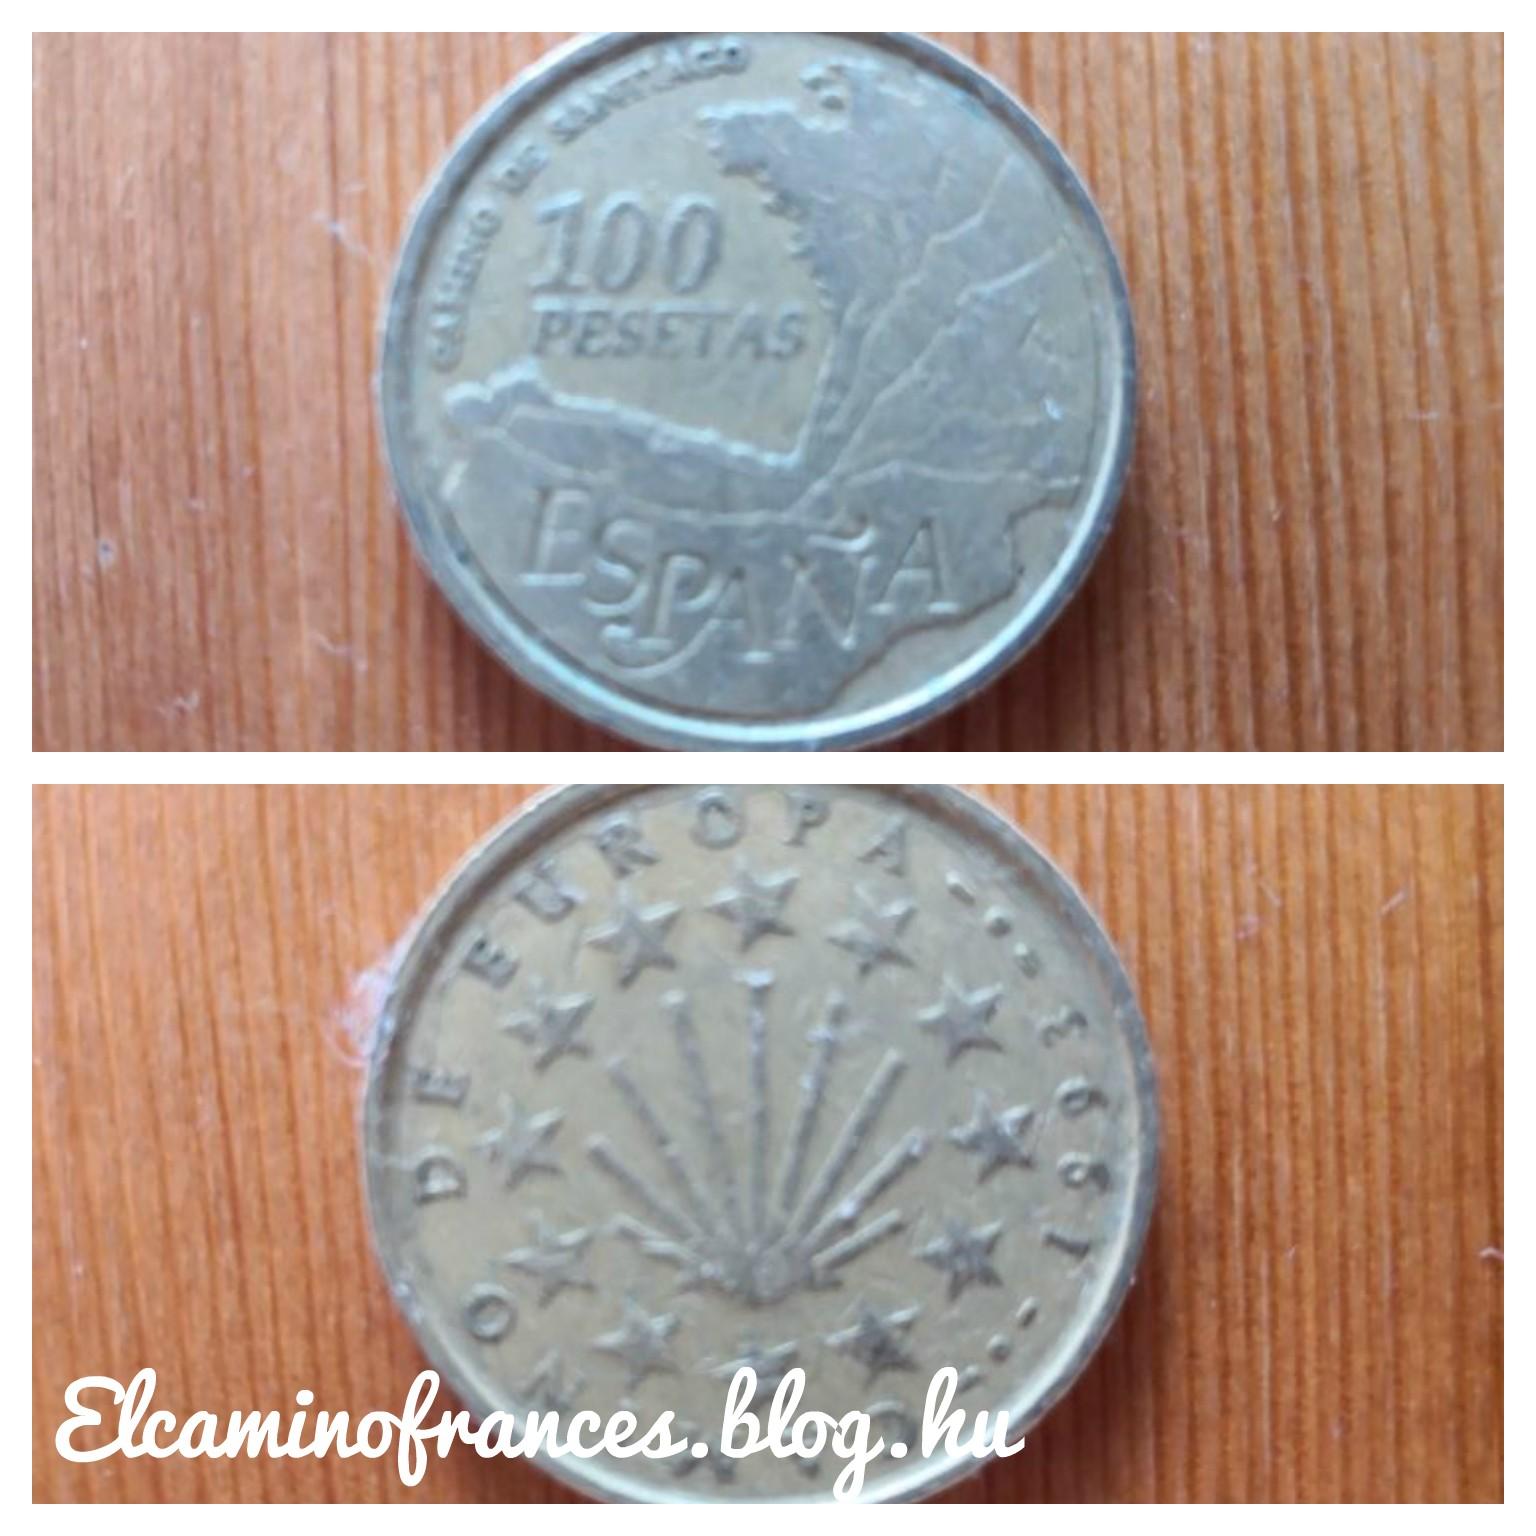 el_camino_penzerme_peseta_euro_cent_4.jpg